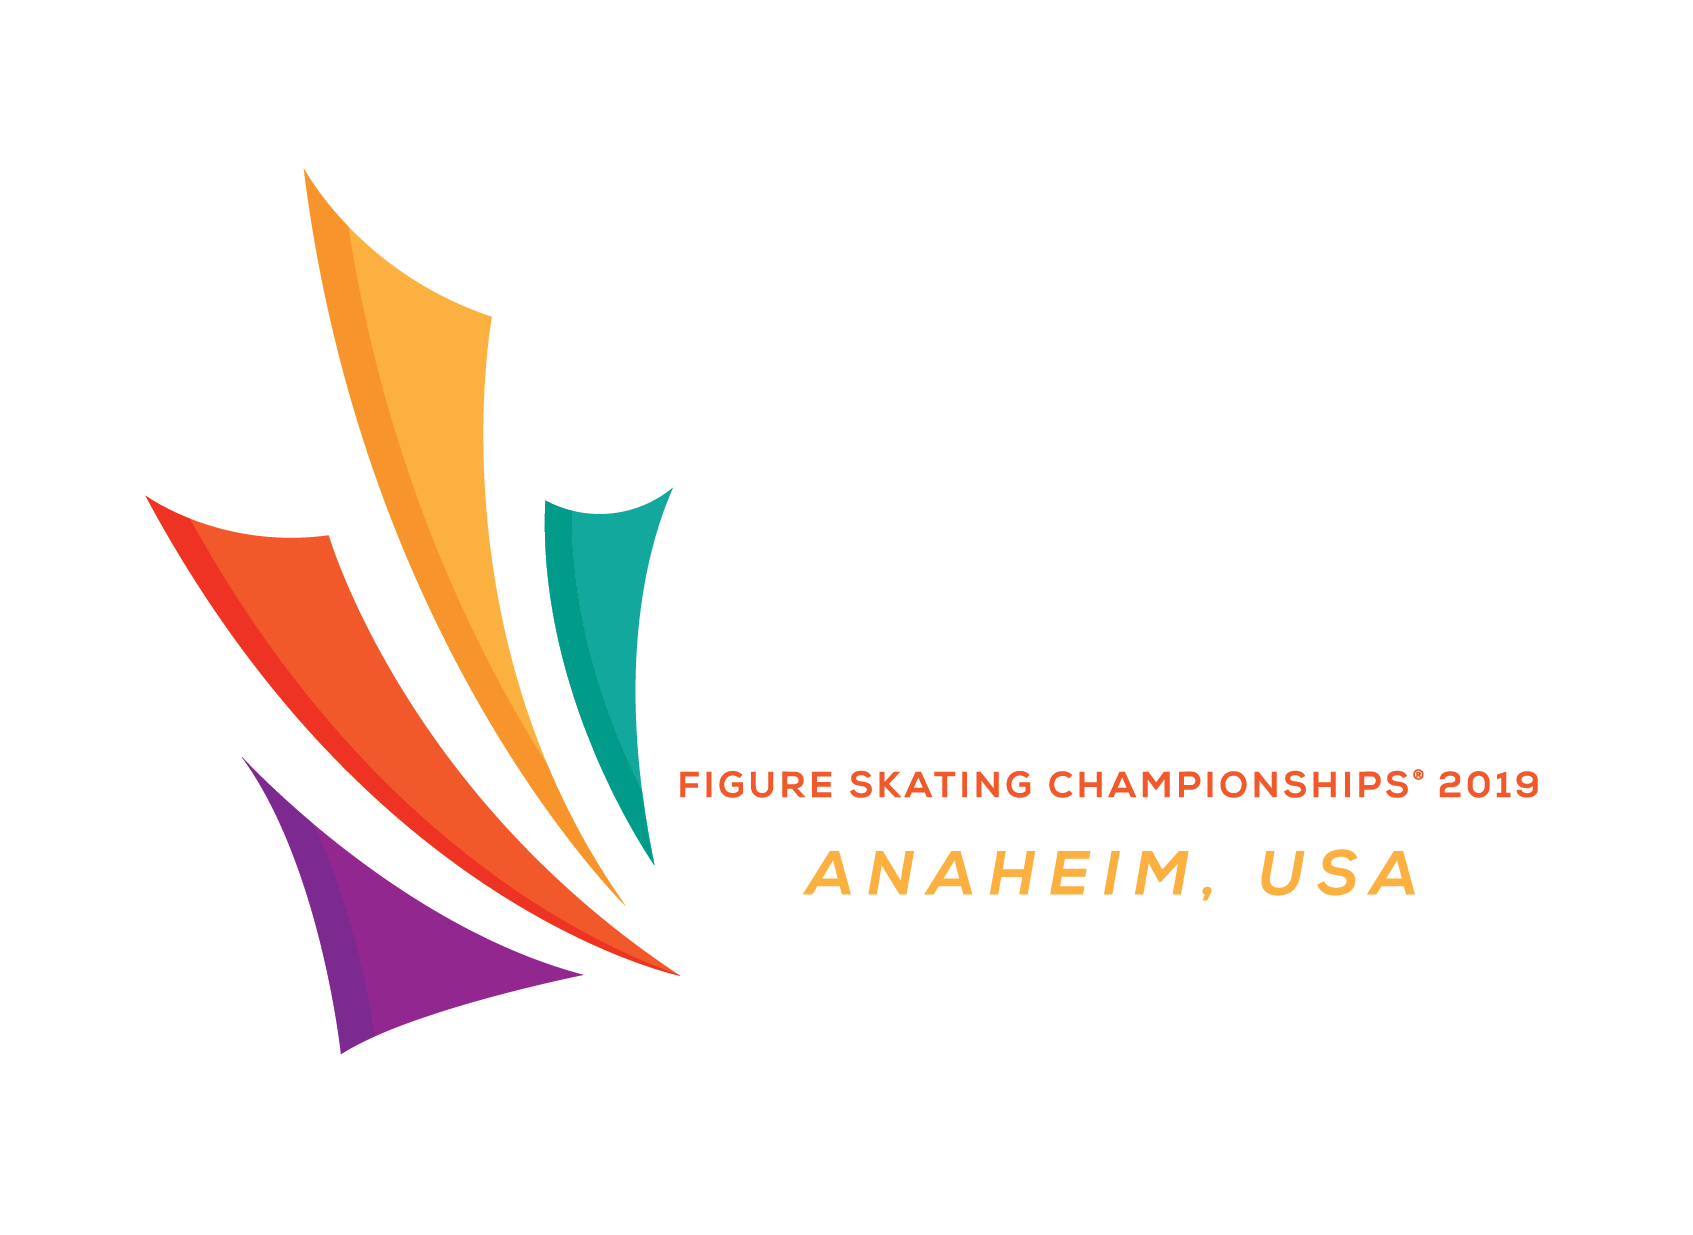 Isu Four Continents